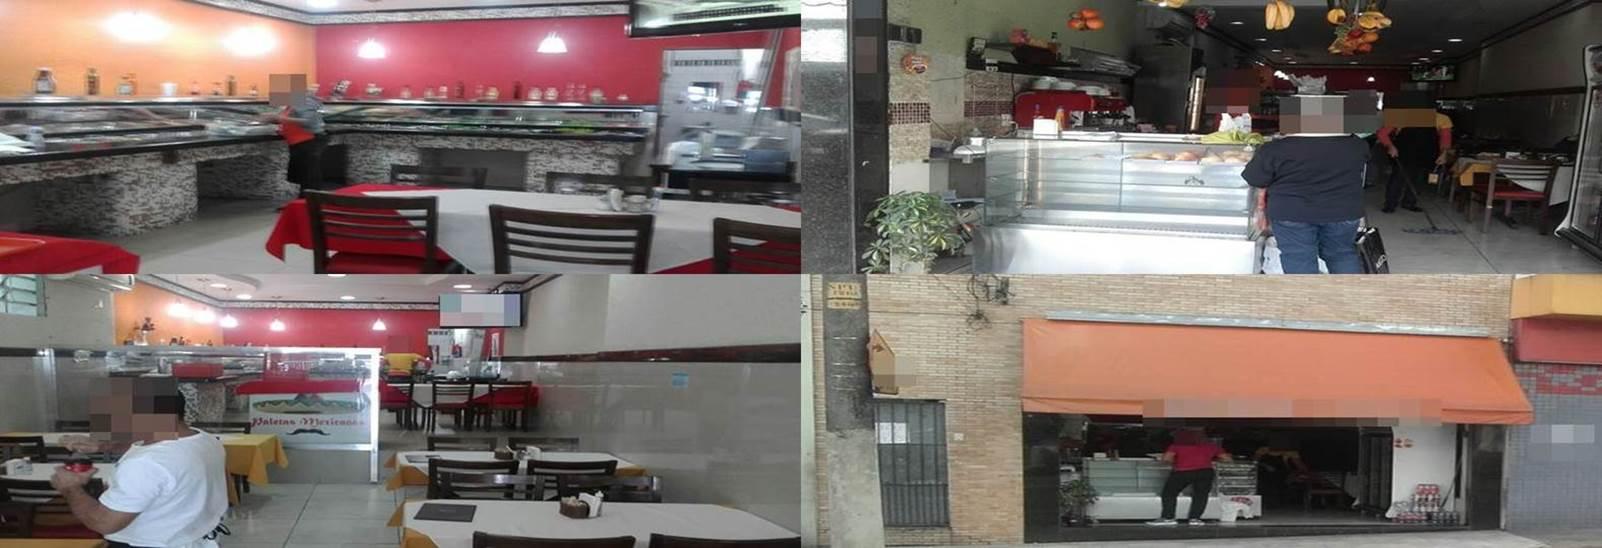 Café e Restaurante Zona Oeste